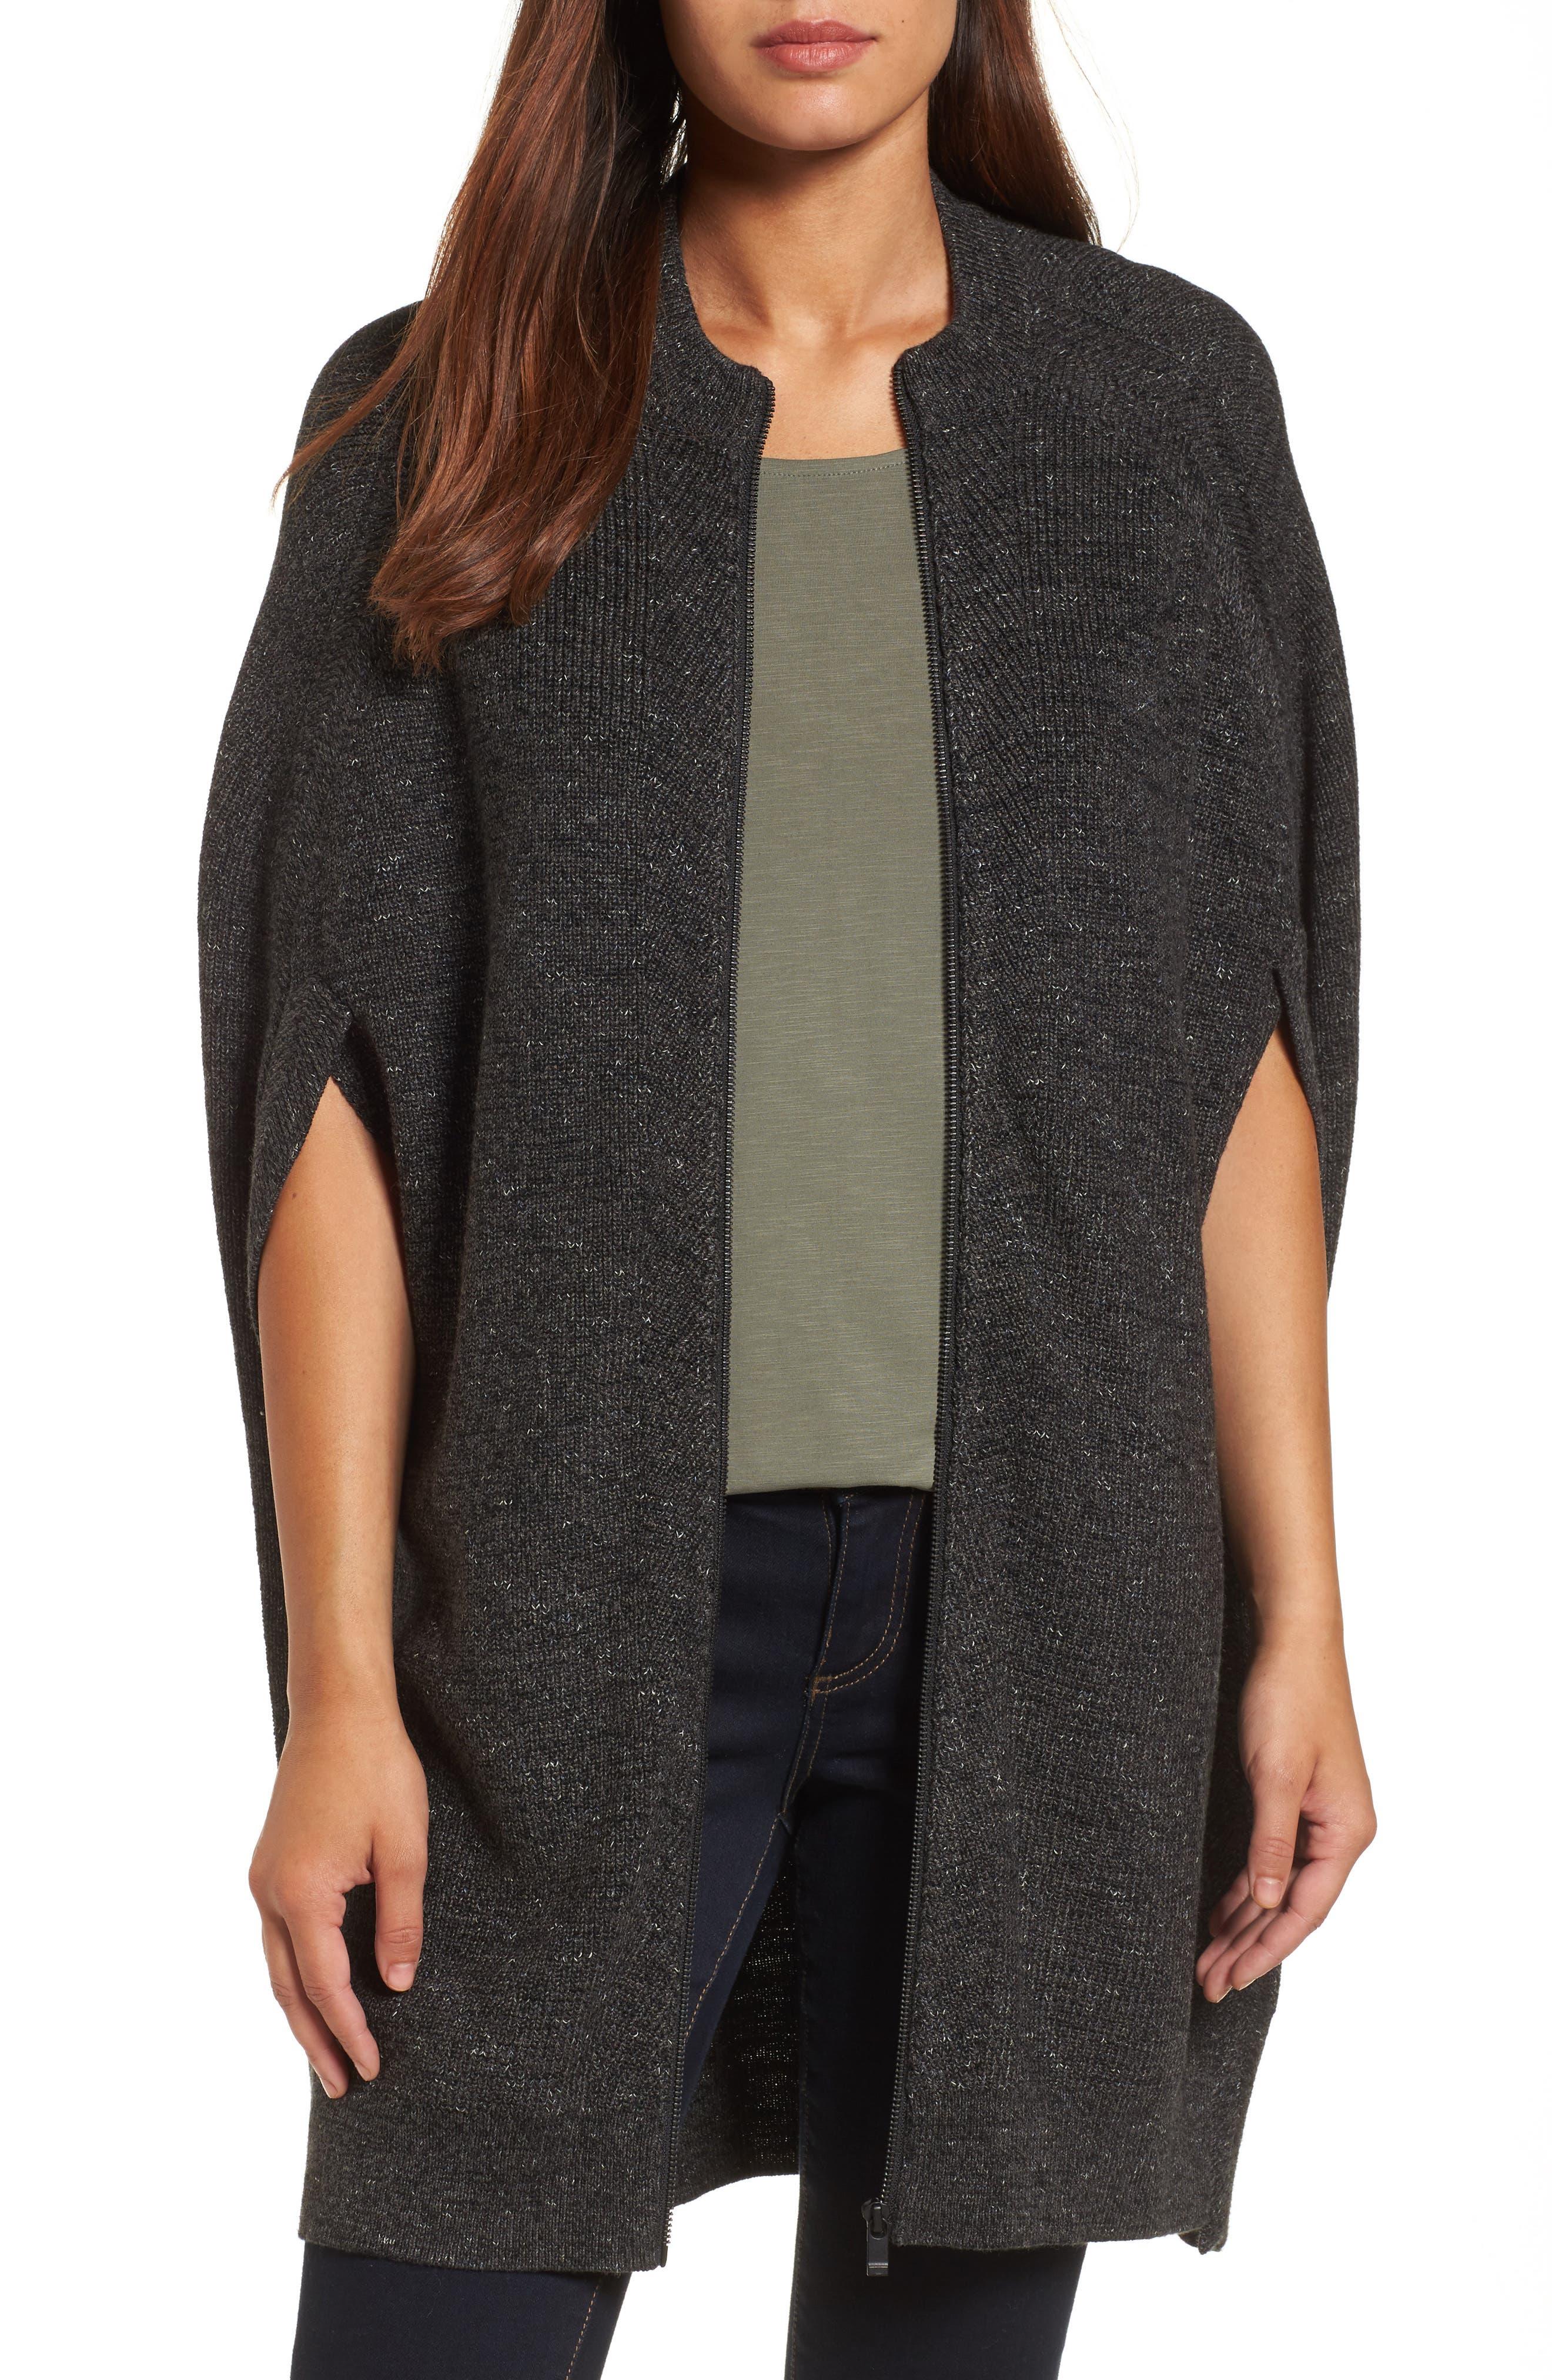 NIC + ZOE Blanket Cape,                         Main,                         color, Black Onyx